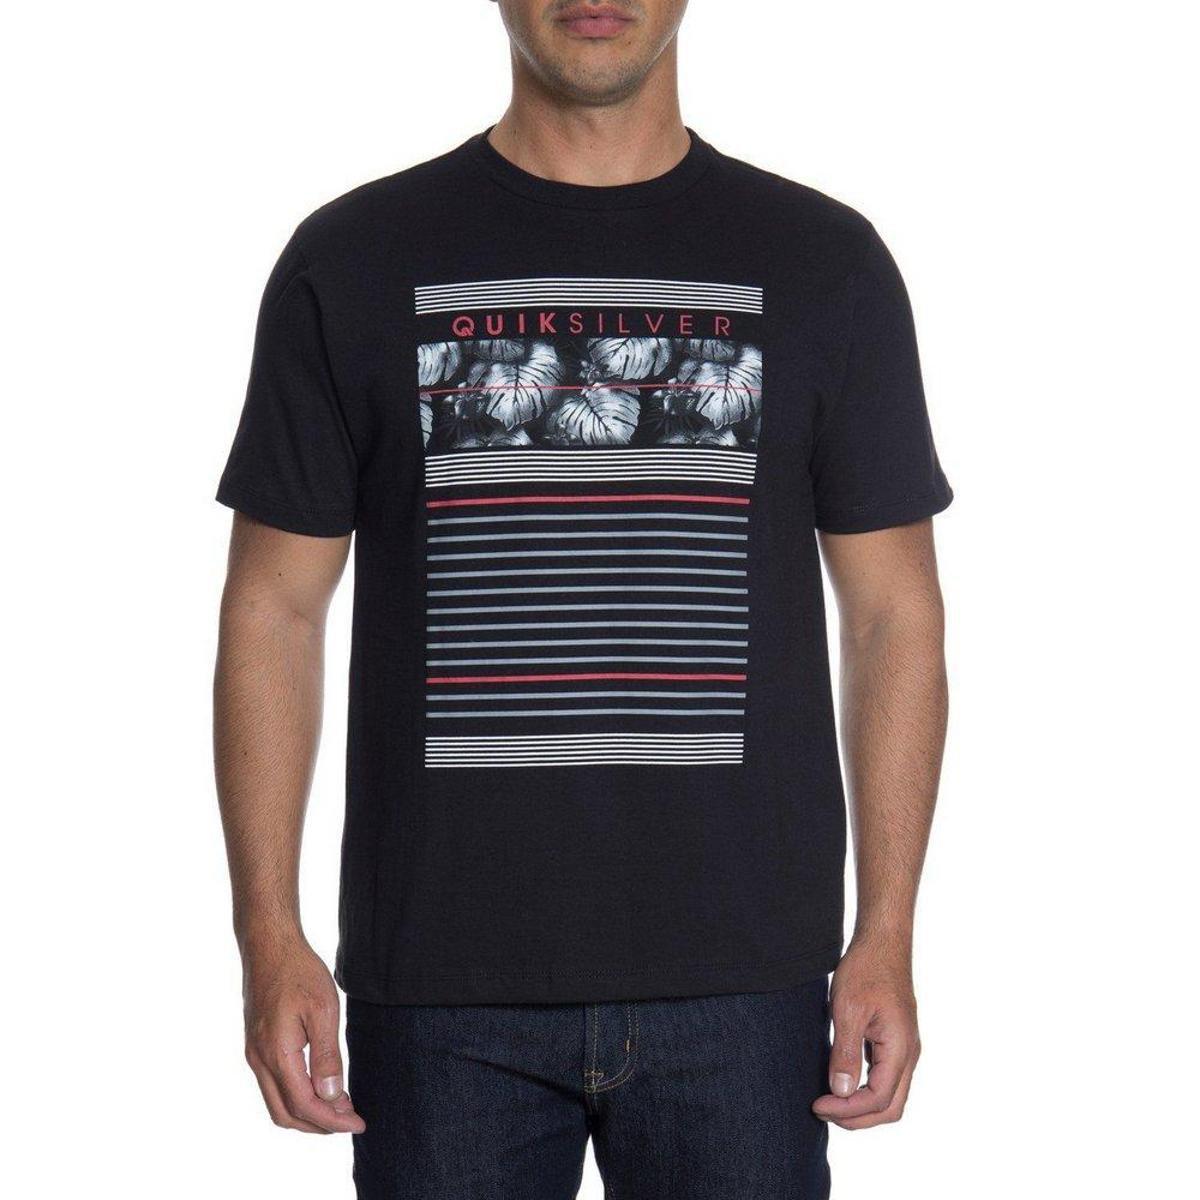 Camiseta Quiksilver Line Down - Compre Agora  01095e4eb66